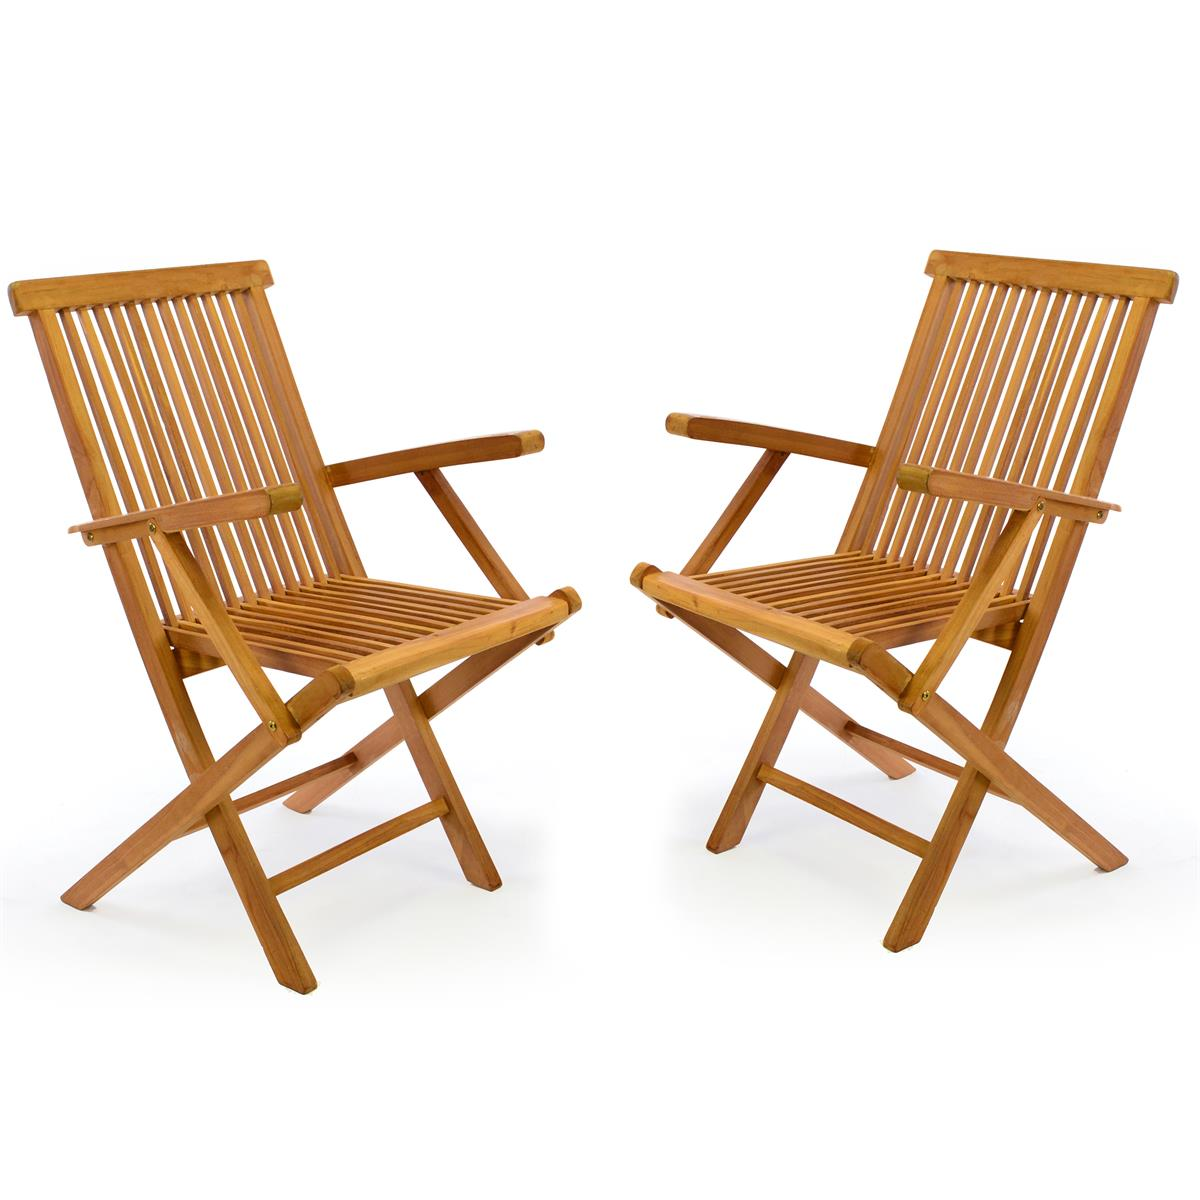 DIVERO 2er Set Hochlehner Klappstuhl Gartenstuhl Stuhl Teak Holz behandelt